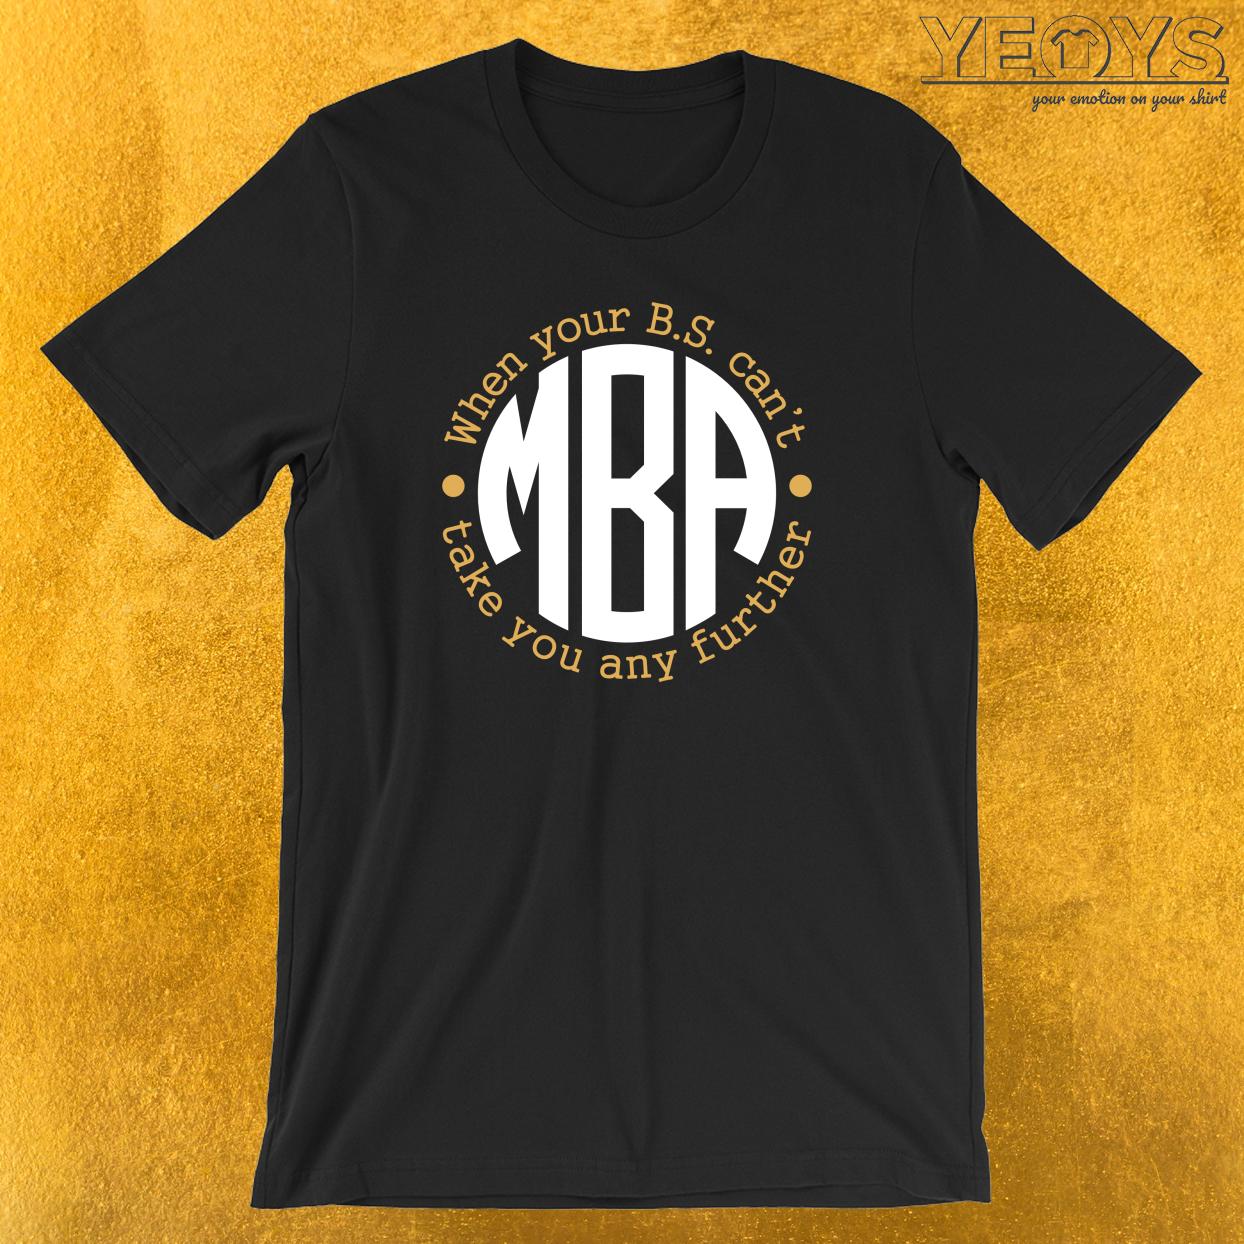 M.B.A. When Your B.S. Can't Take You Any Further T-Shirt